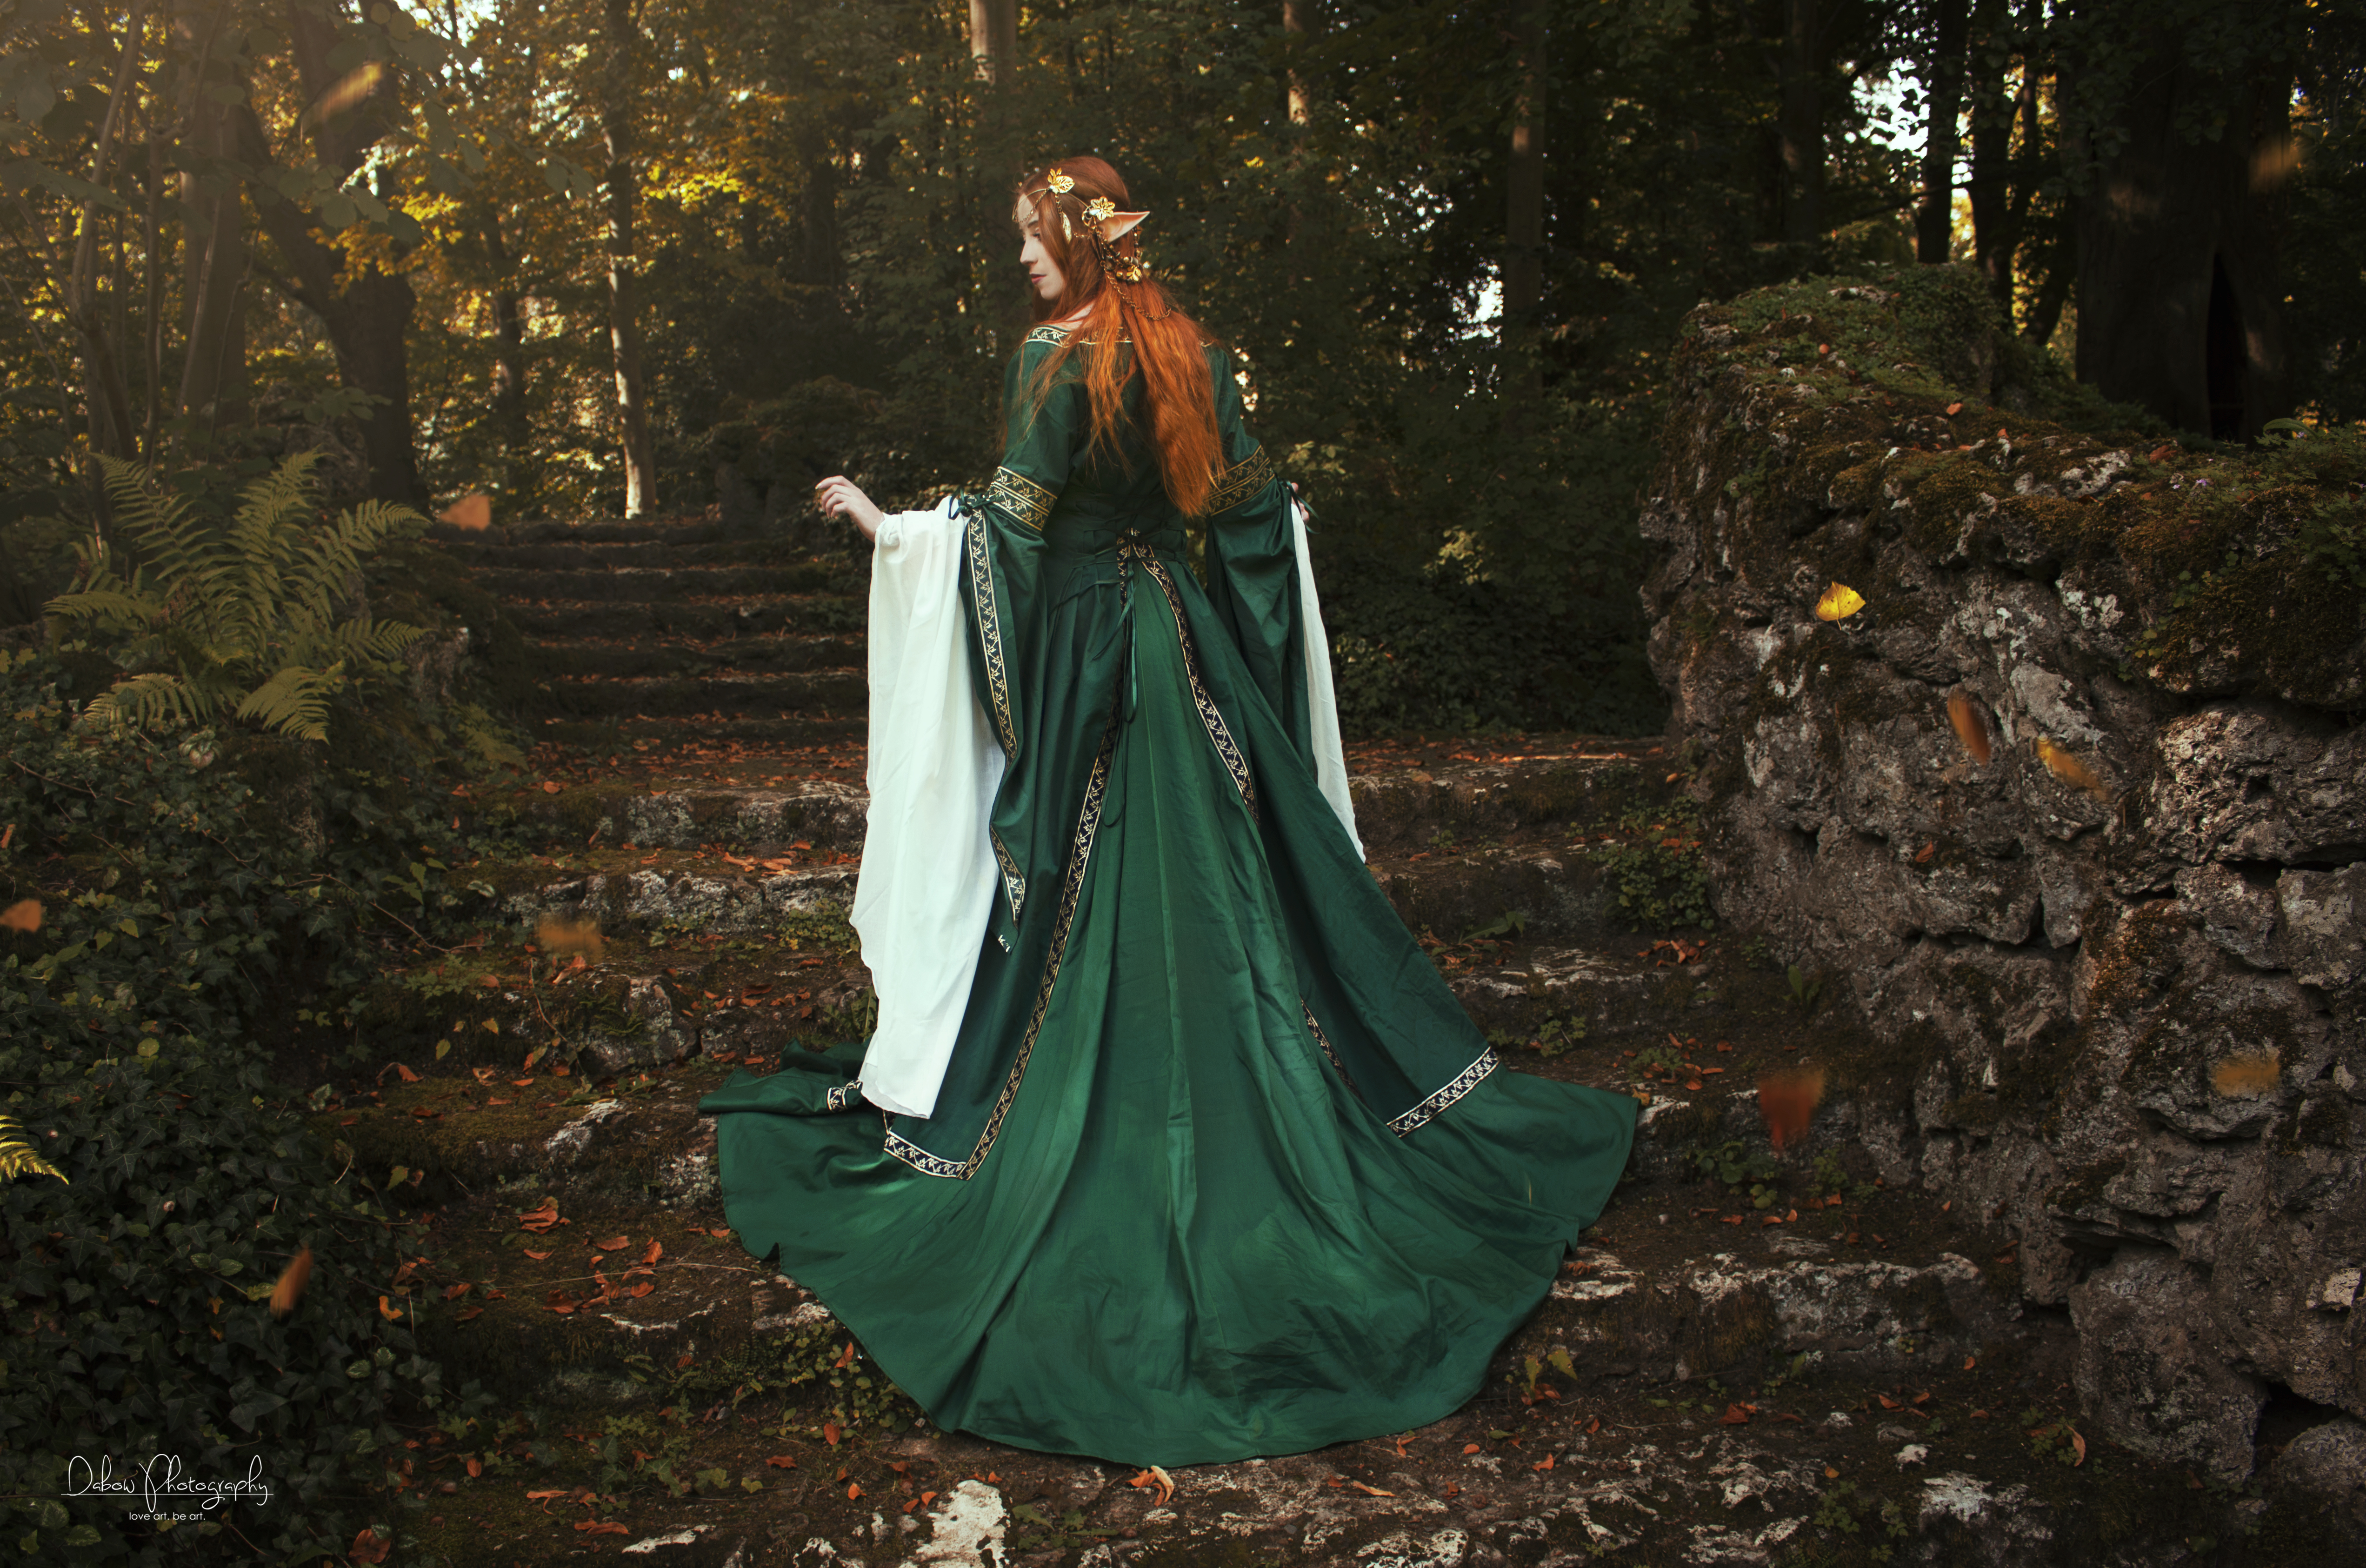 Grünes Elbenkleid umgearbeitet. Fotografin: Dabow Photography. Model: Sonny Ben